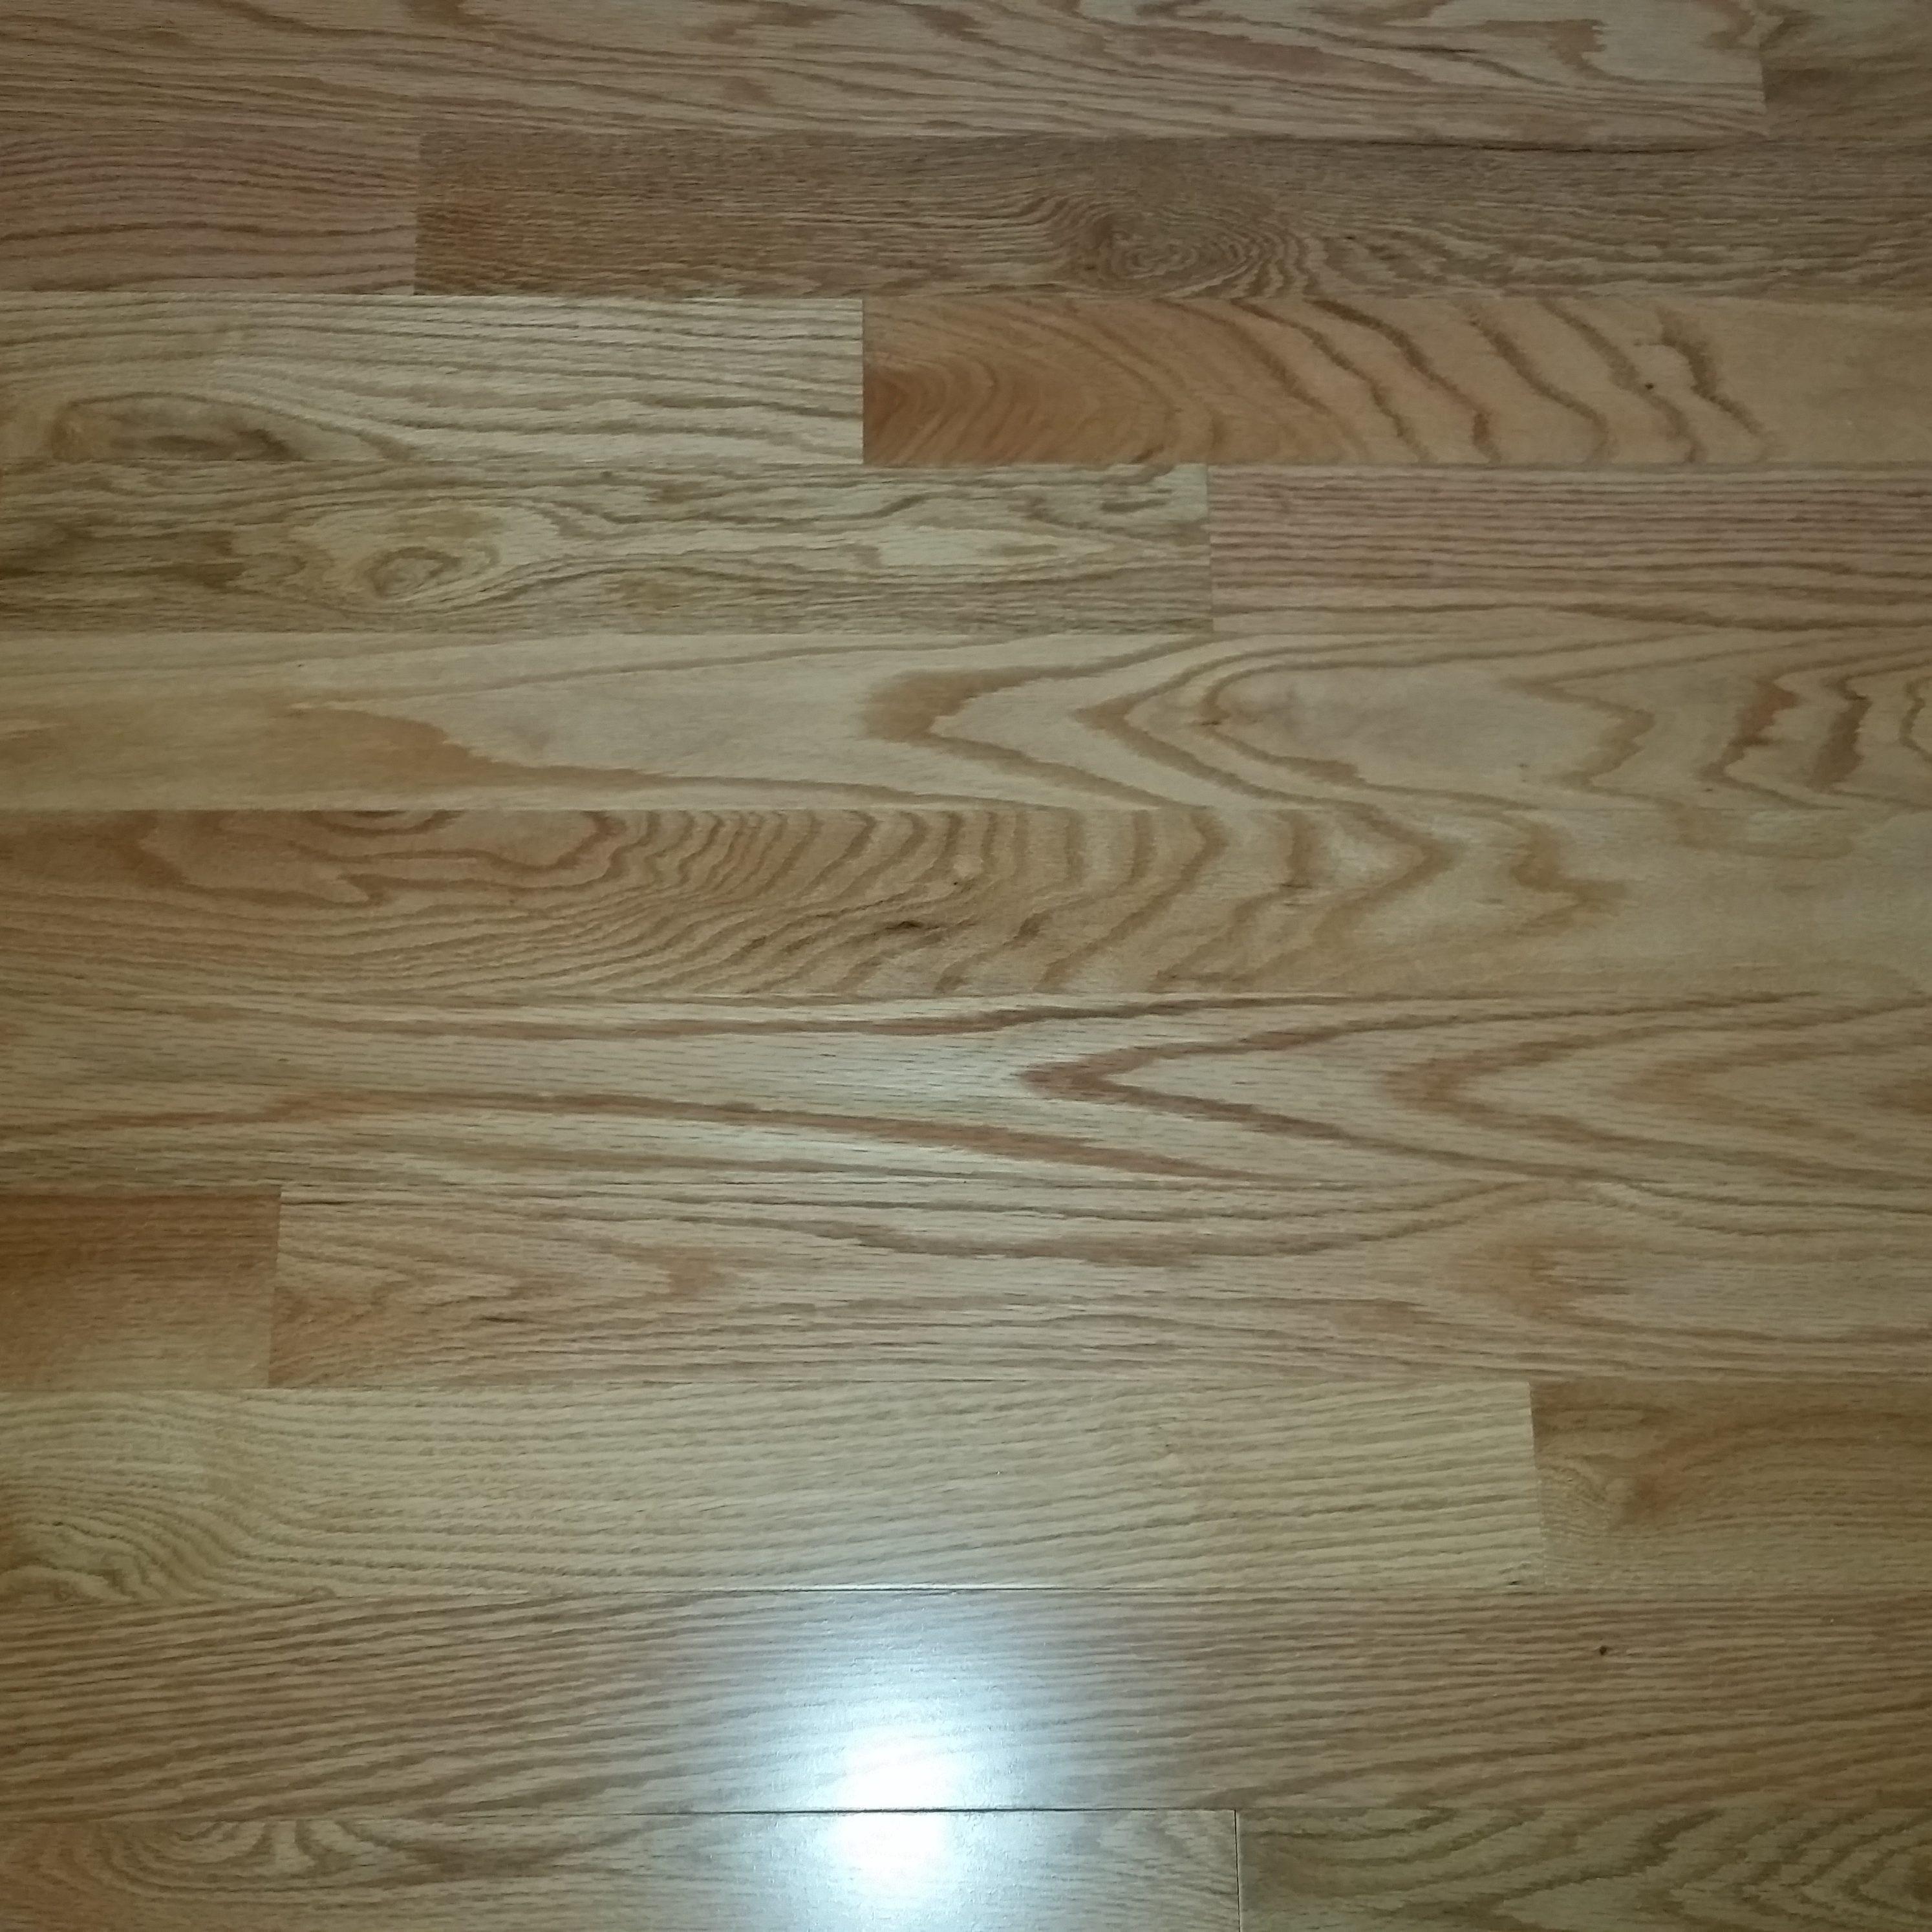 hardwood flooring richmond va of hardwood floor refinishing richmond va floor in hardwood floor refinishing richmond va can pets and hardwood floors coexist